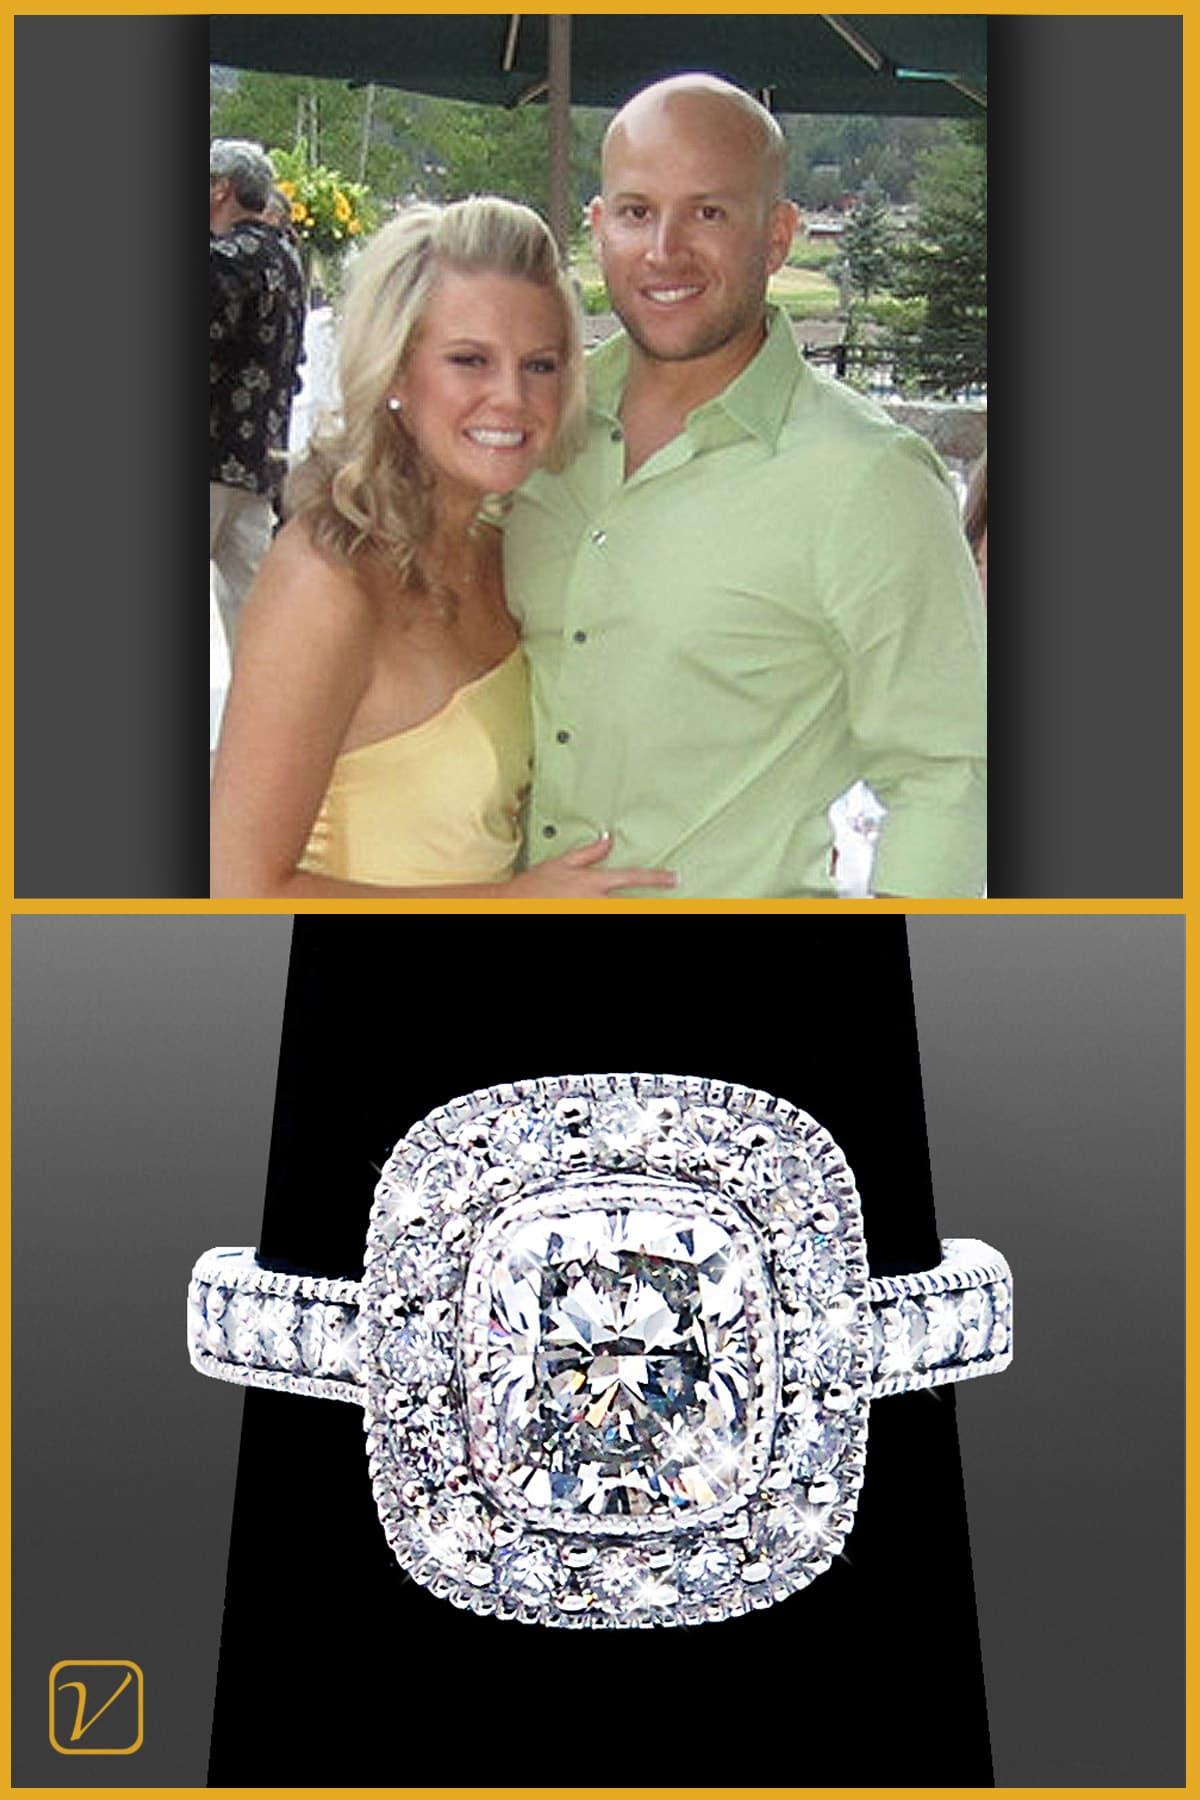 Daniel & Kelli - Vanessa Nicole Jewels Custom Engagement Rings - Testimonials